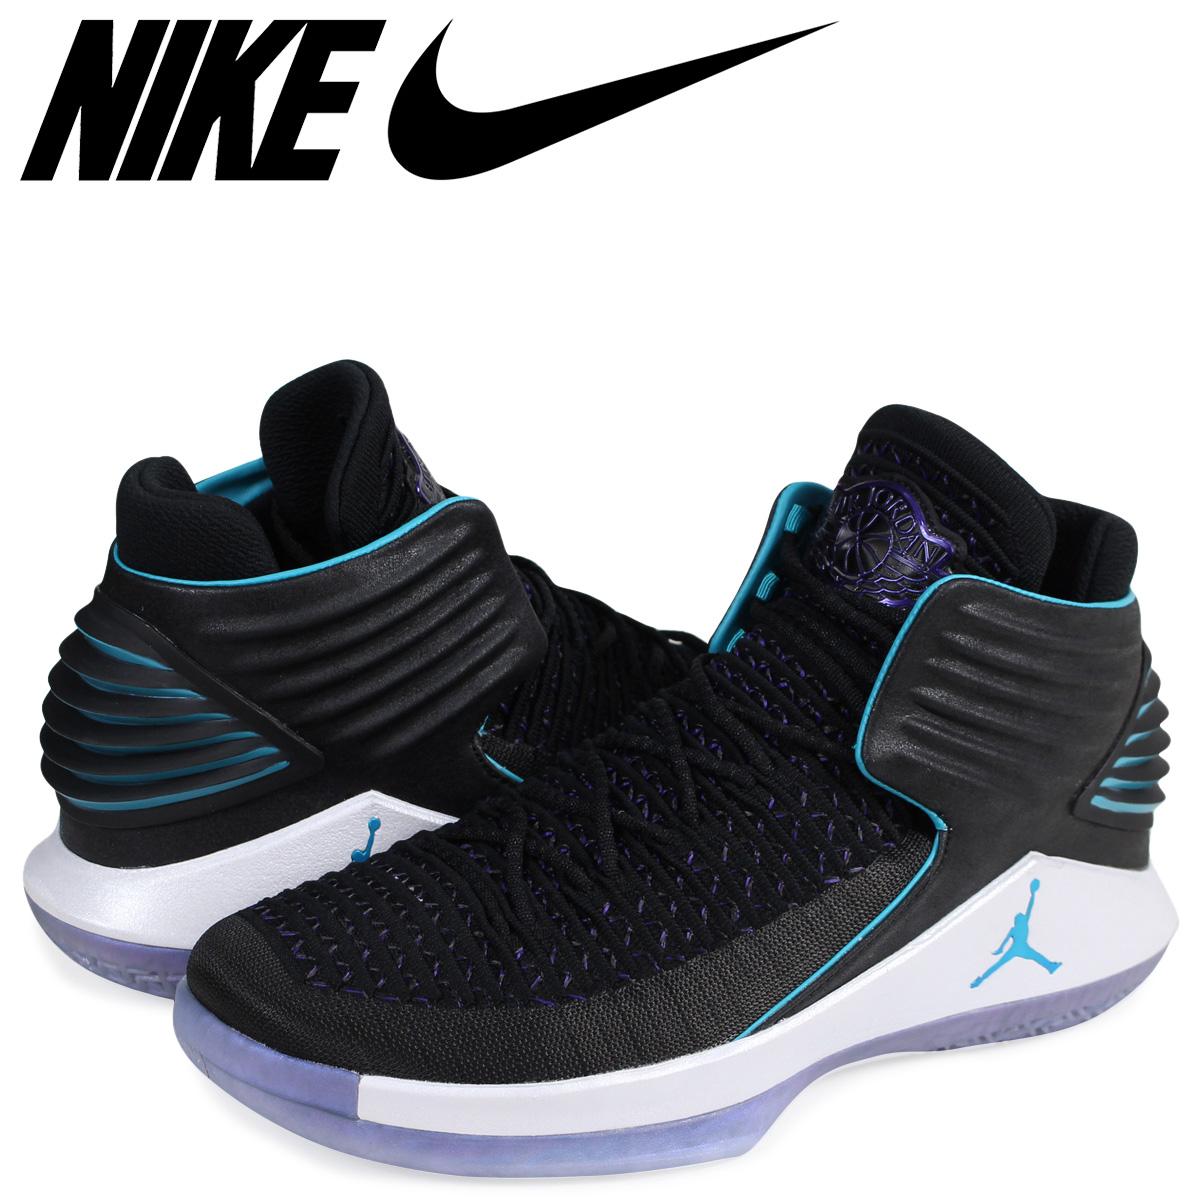 5b2af75ad397 ALLSPORTS  NIKE AIR JORDAN 32 LOW PF GATORADE Nike Air Jordan 32 ...